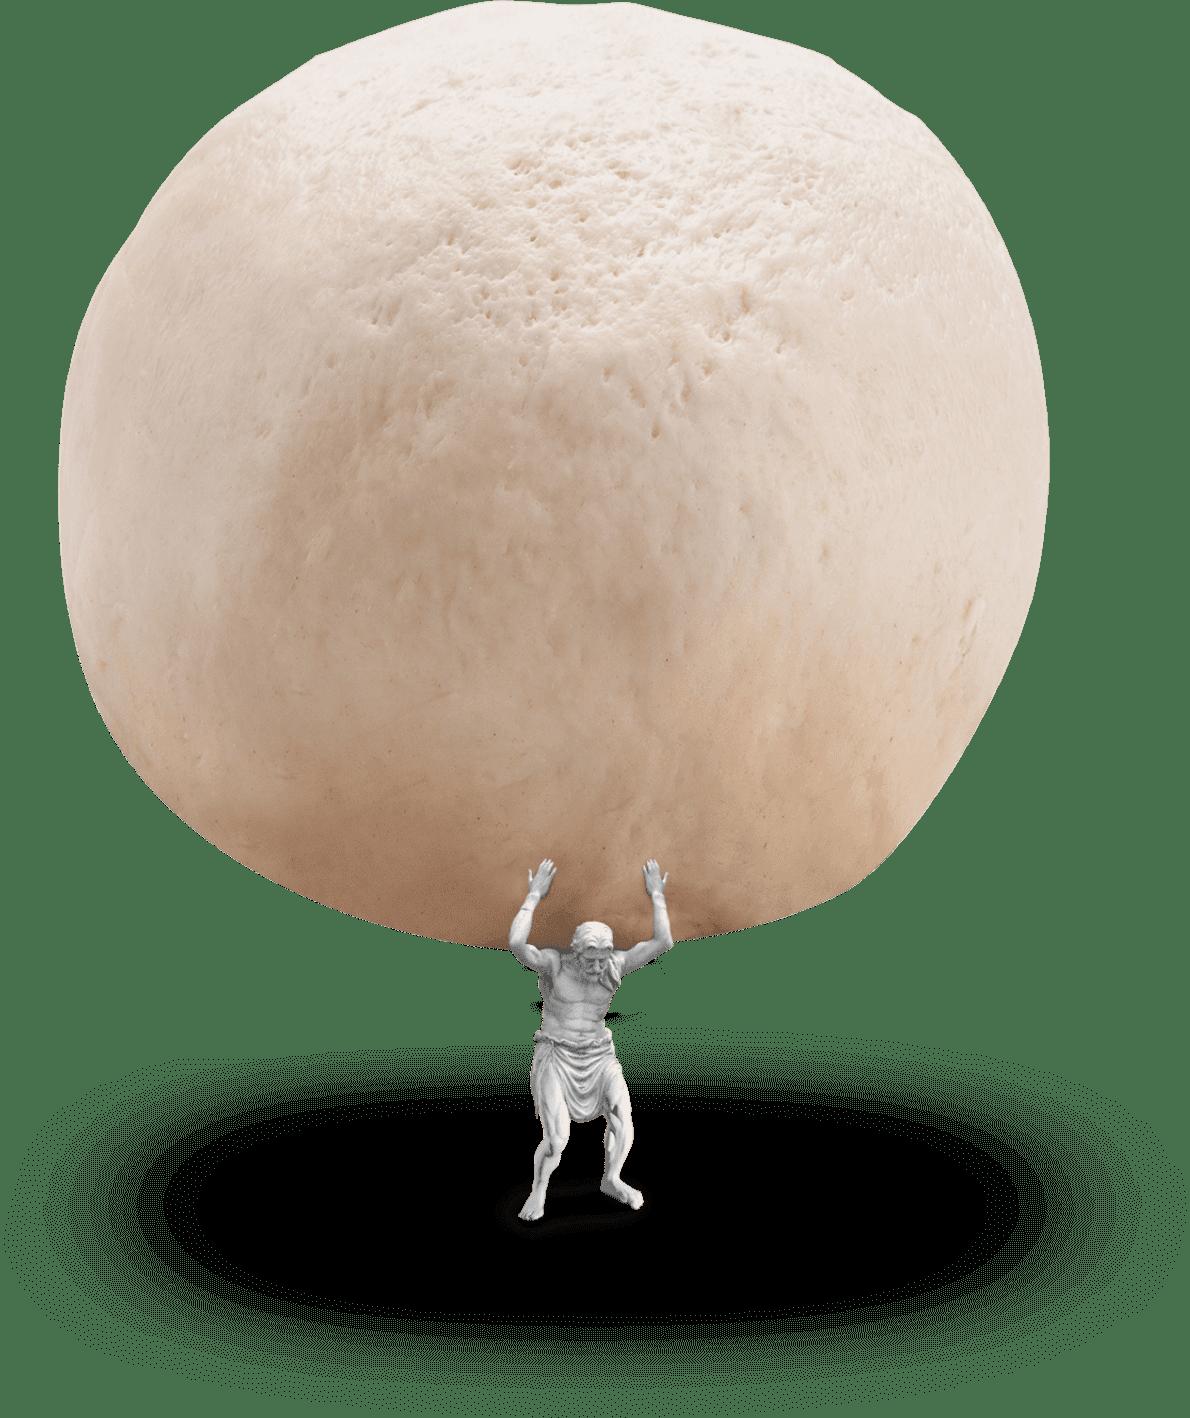 Holy Napoli Frozen Pizza Atlas Carrying Dough